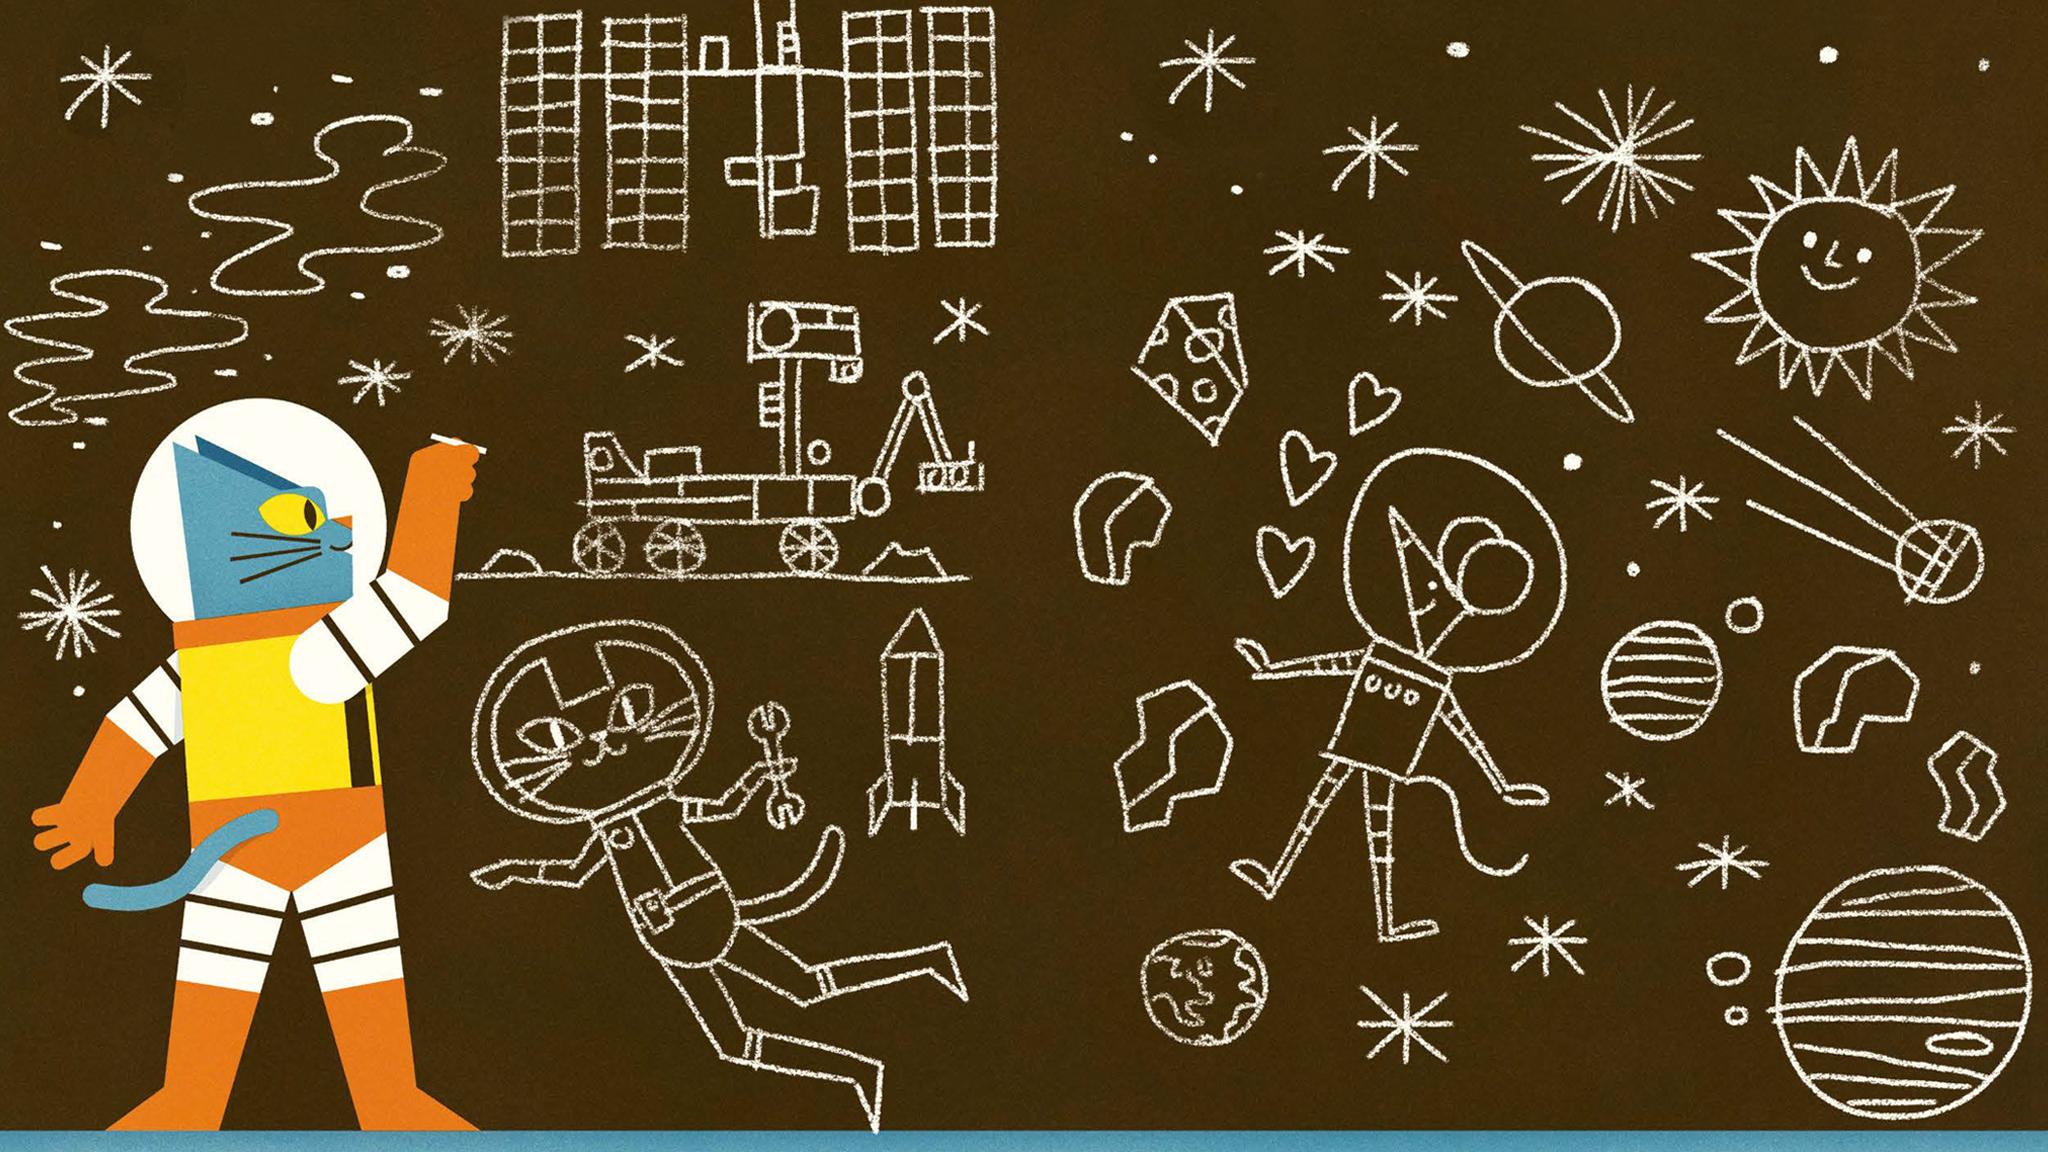 Astro_chalkboard_2048x1152